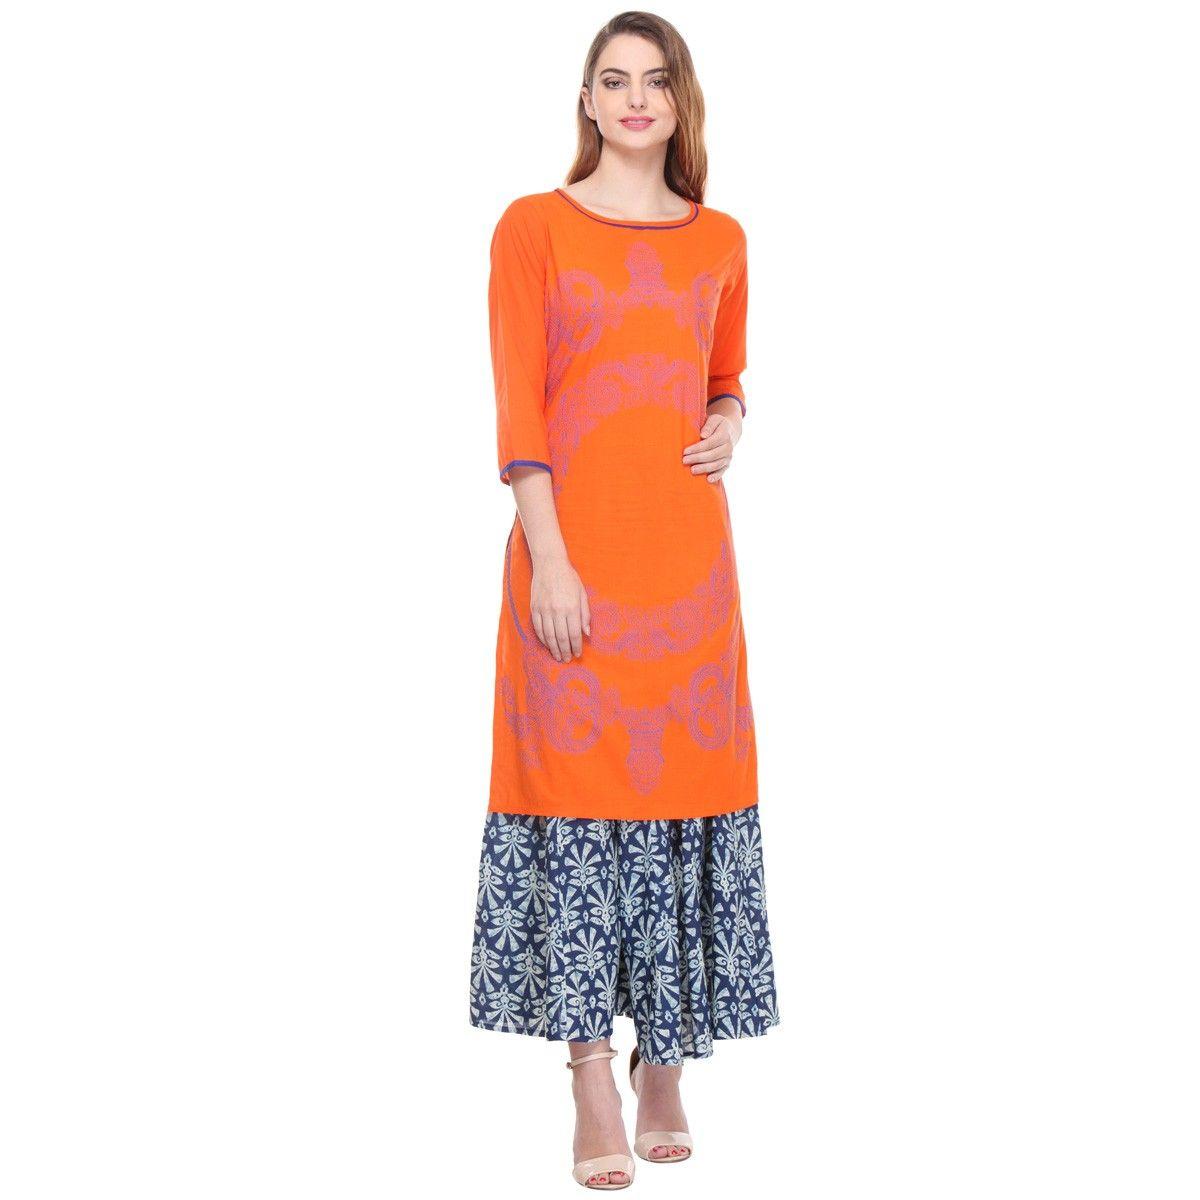 Rs.1099, Buy Online Cotton Orange Stitched Printed Straight Kurti With  Palazzo - M11095 - Varanga - Reviews - IndiaRush